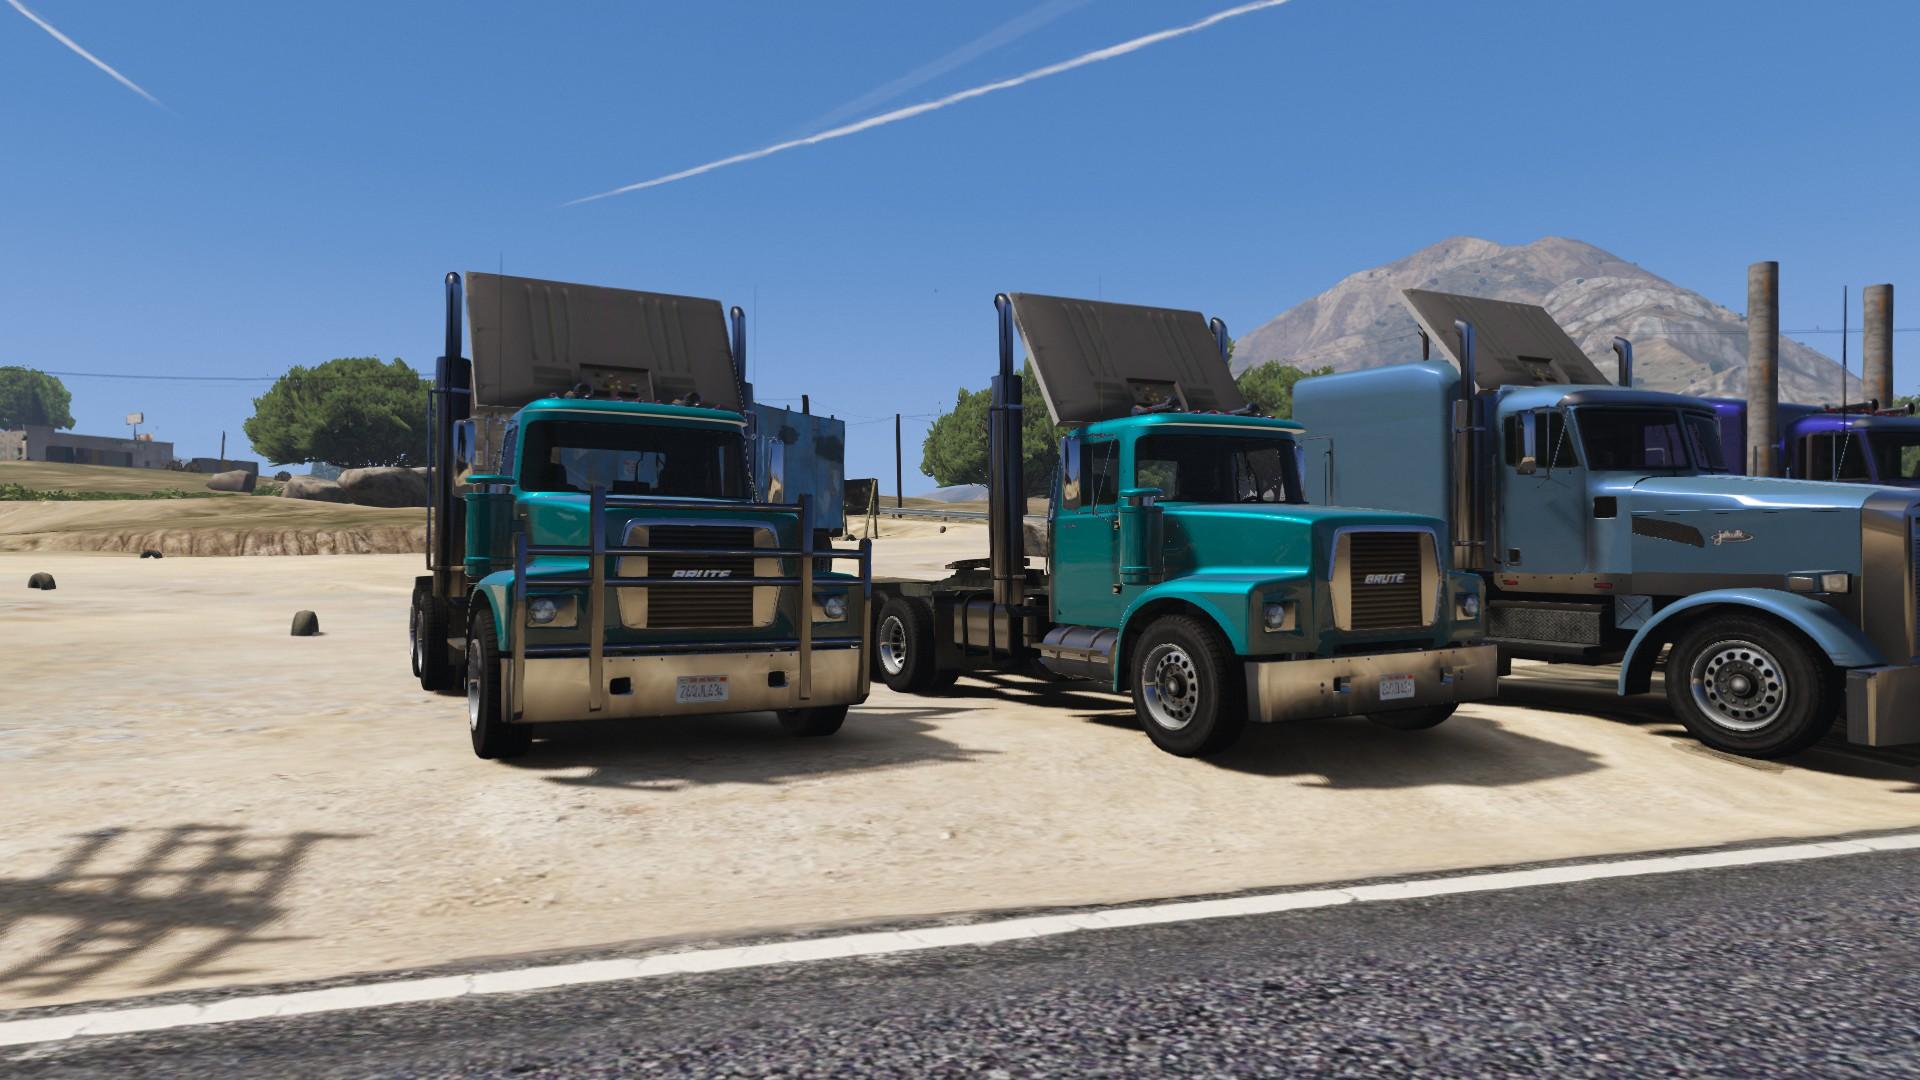 Gta 5 Trucks And Trailers | www.pixshark.com - Images ...